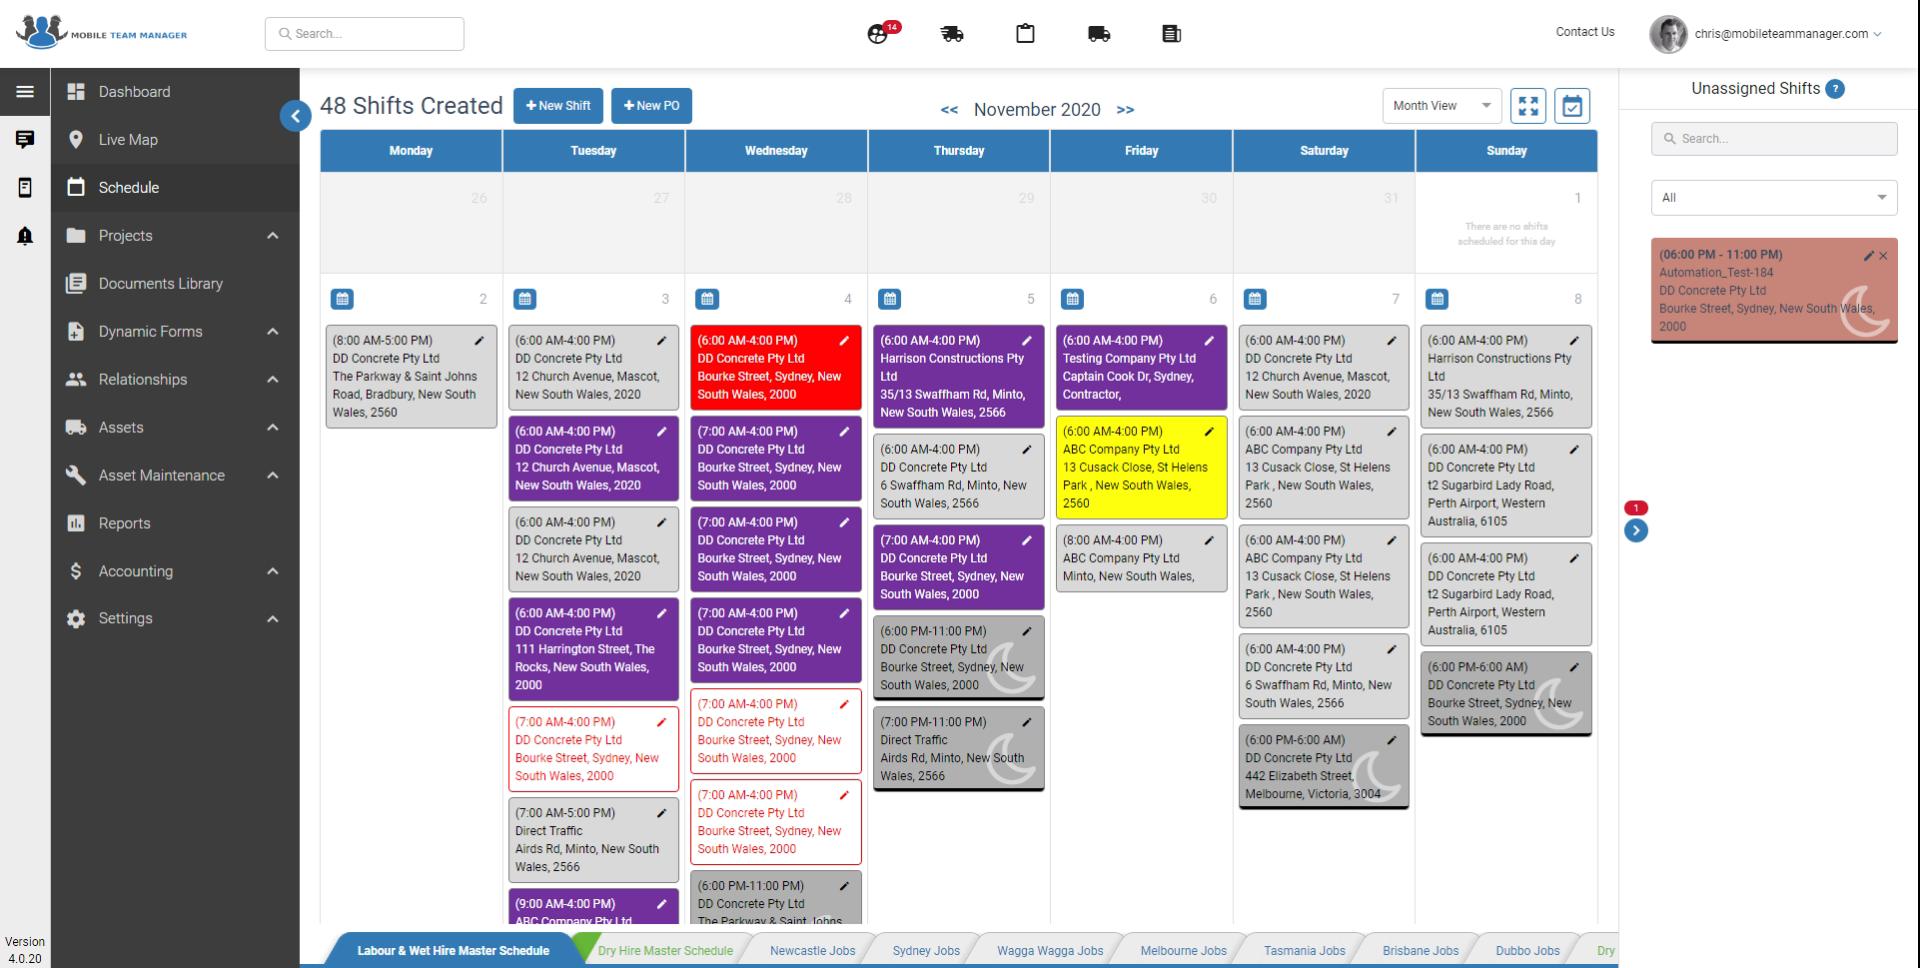 Month view interactive schedule*